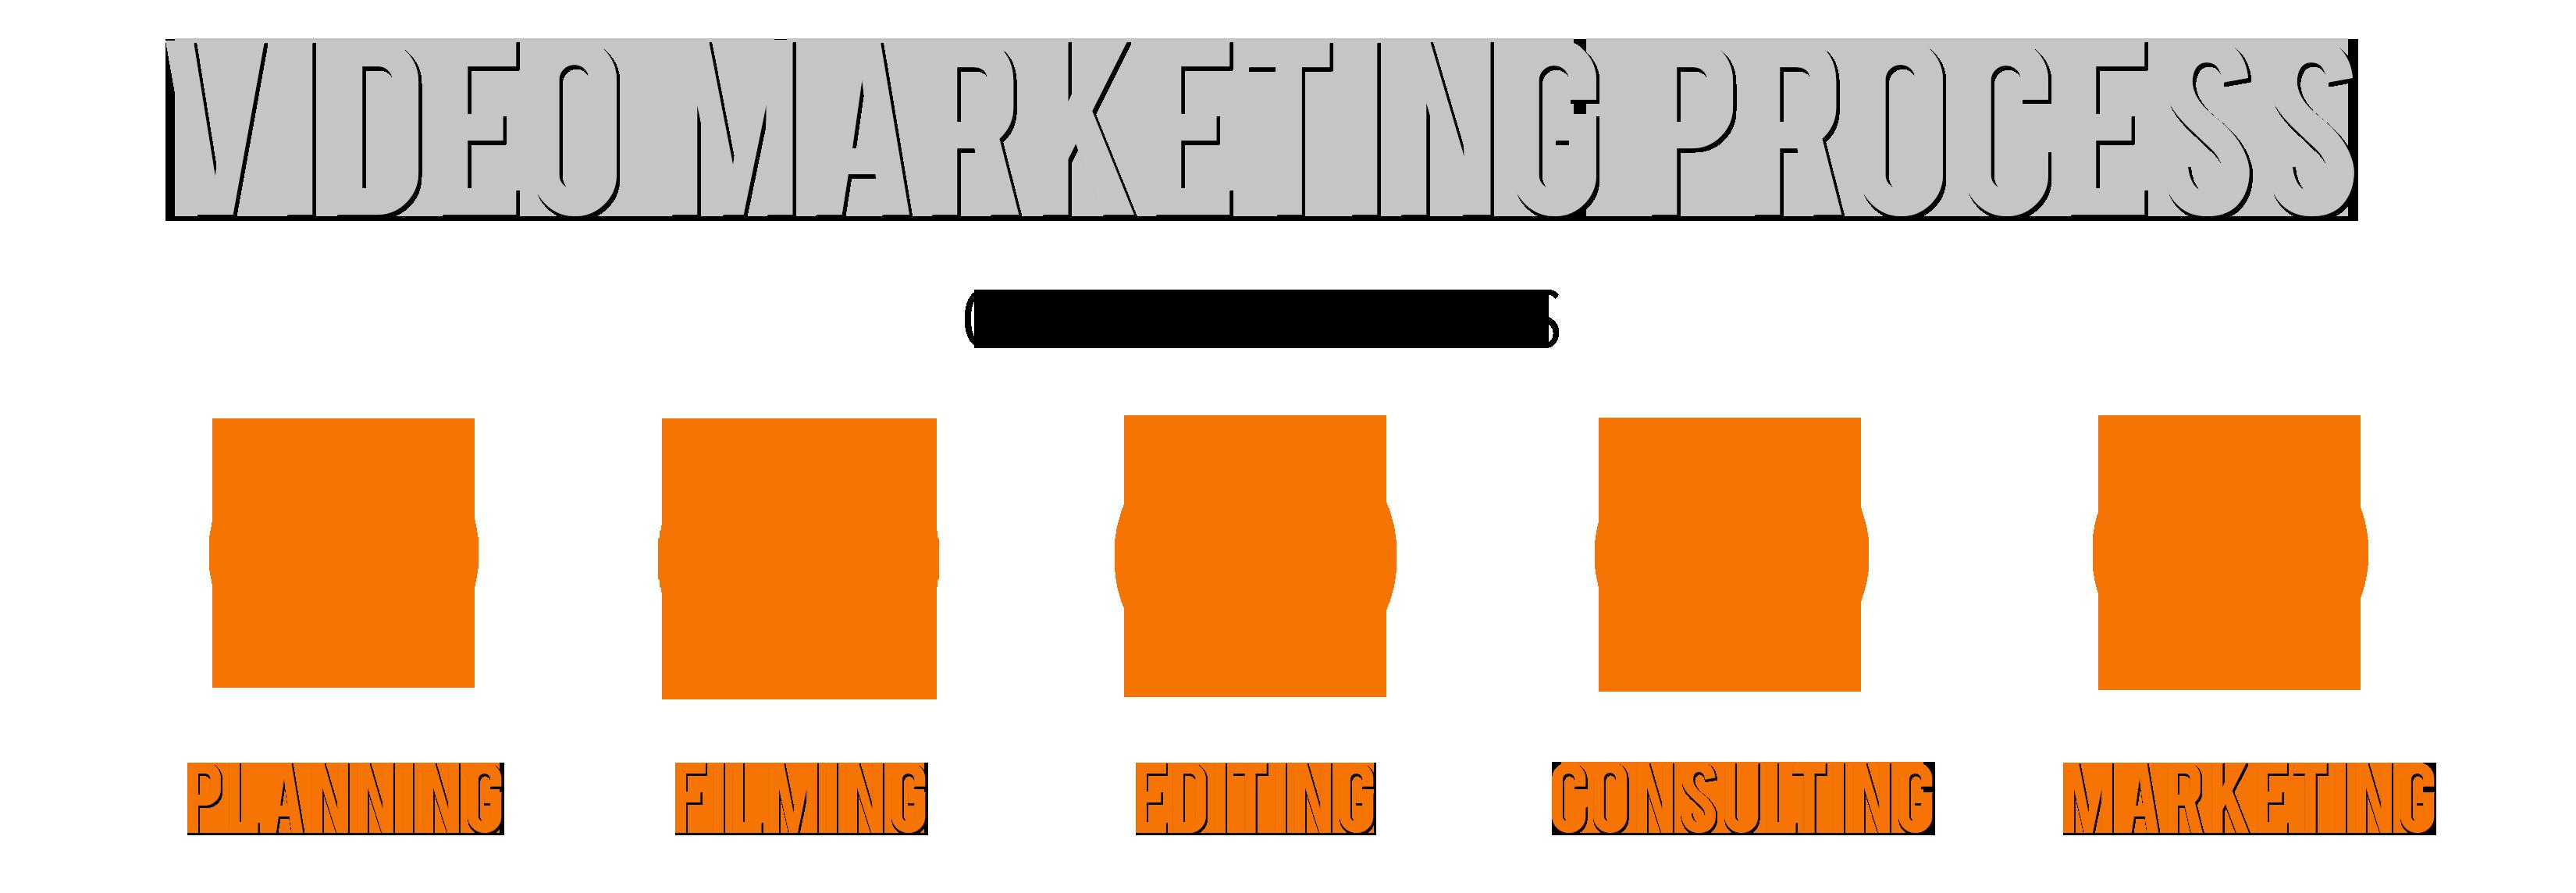 video marketing process_RAW3